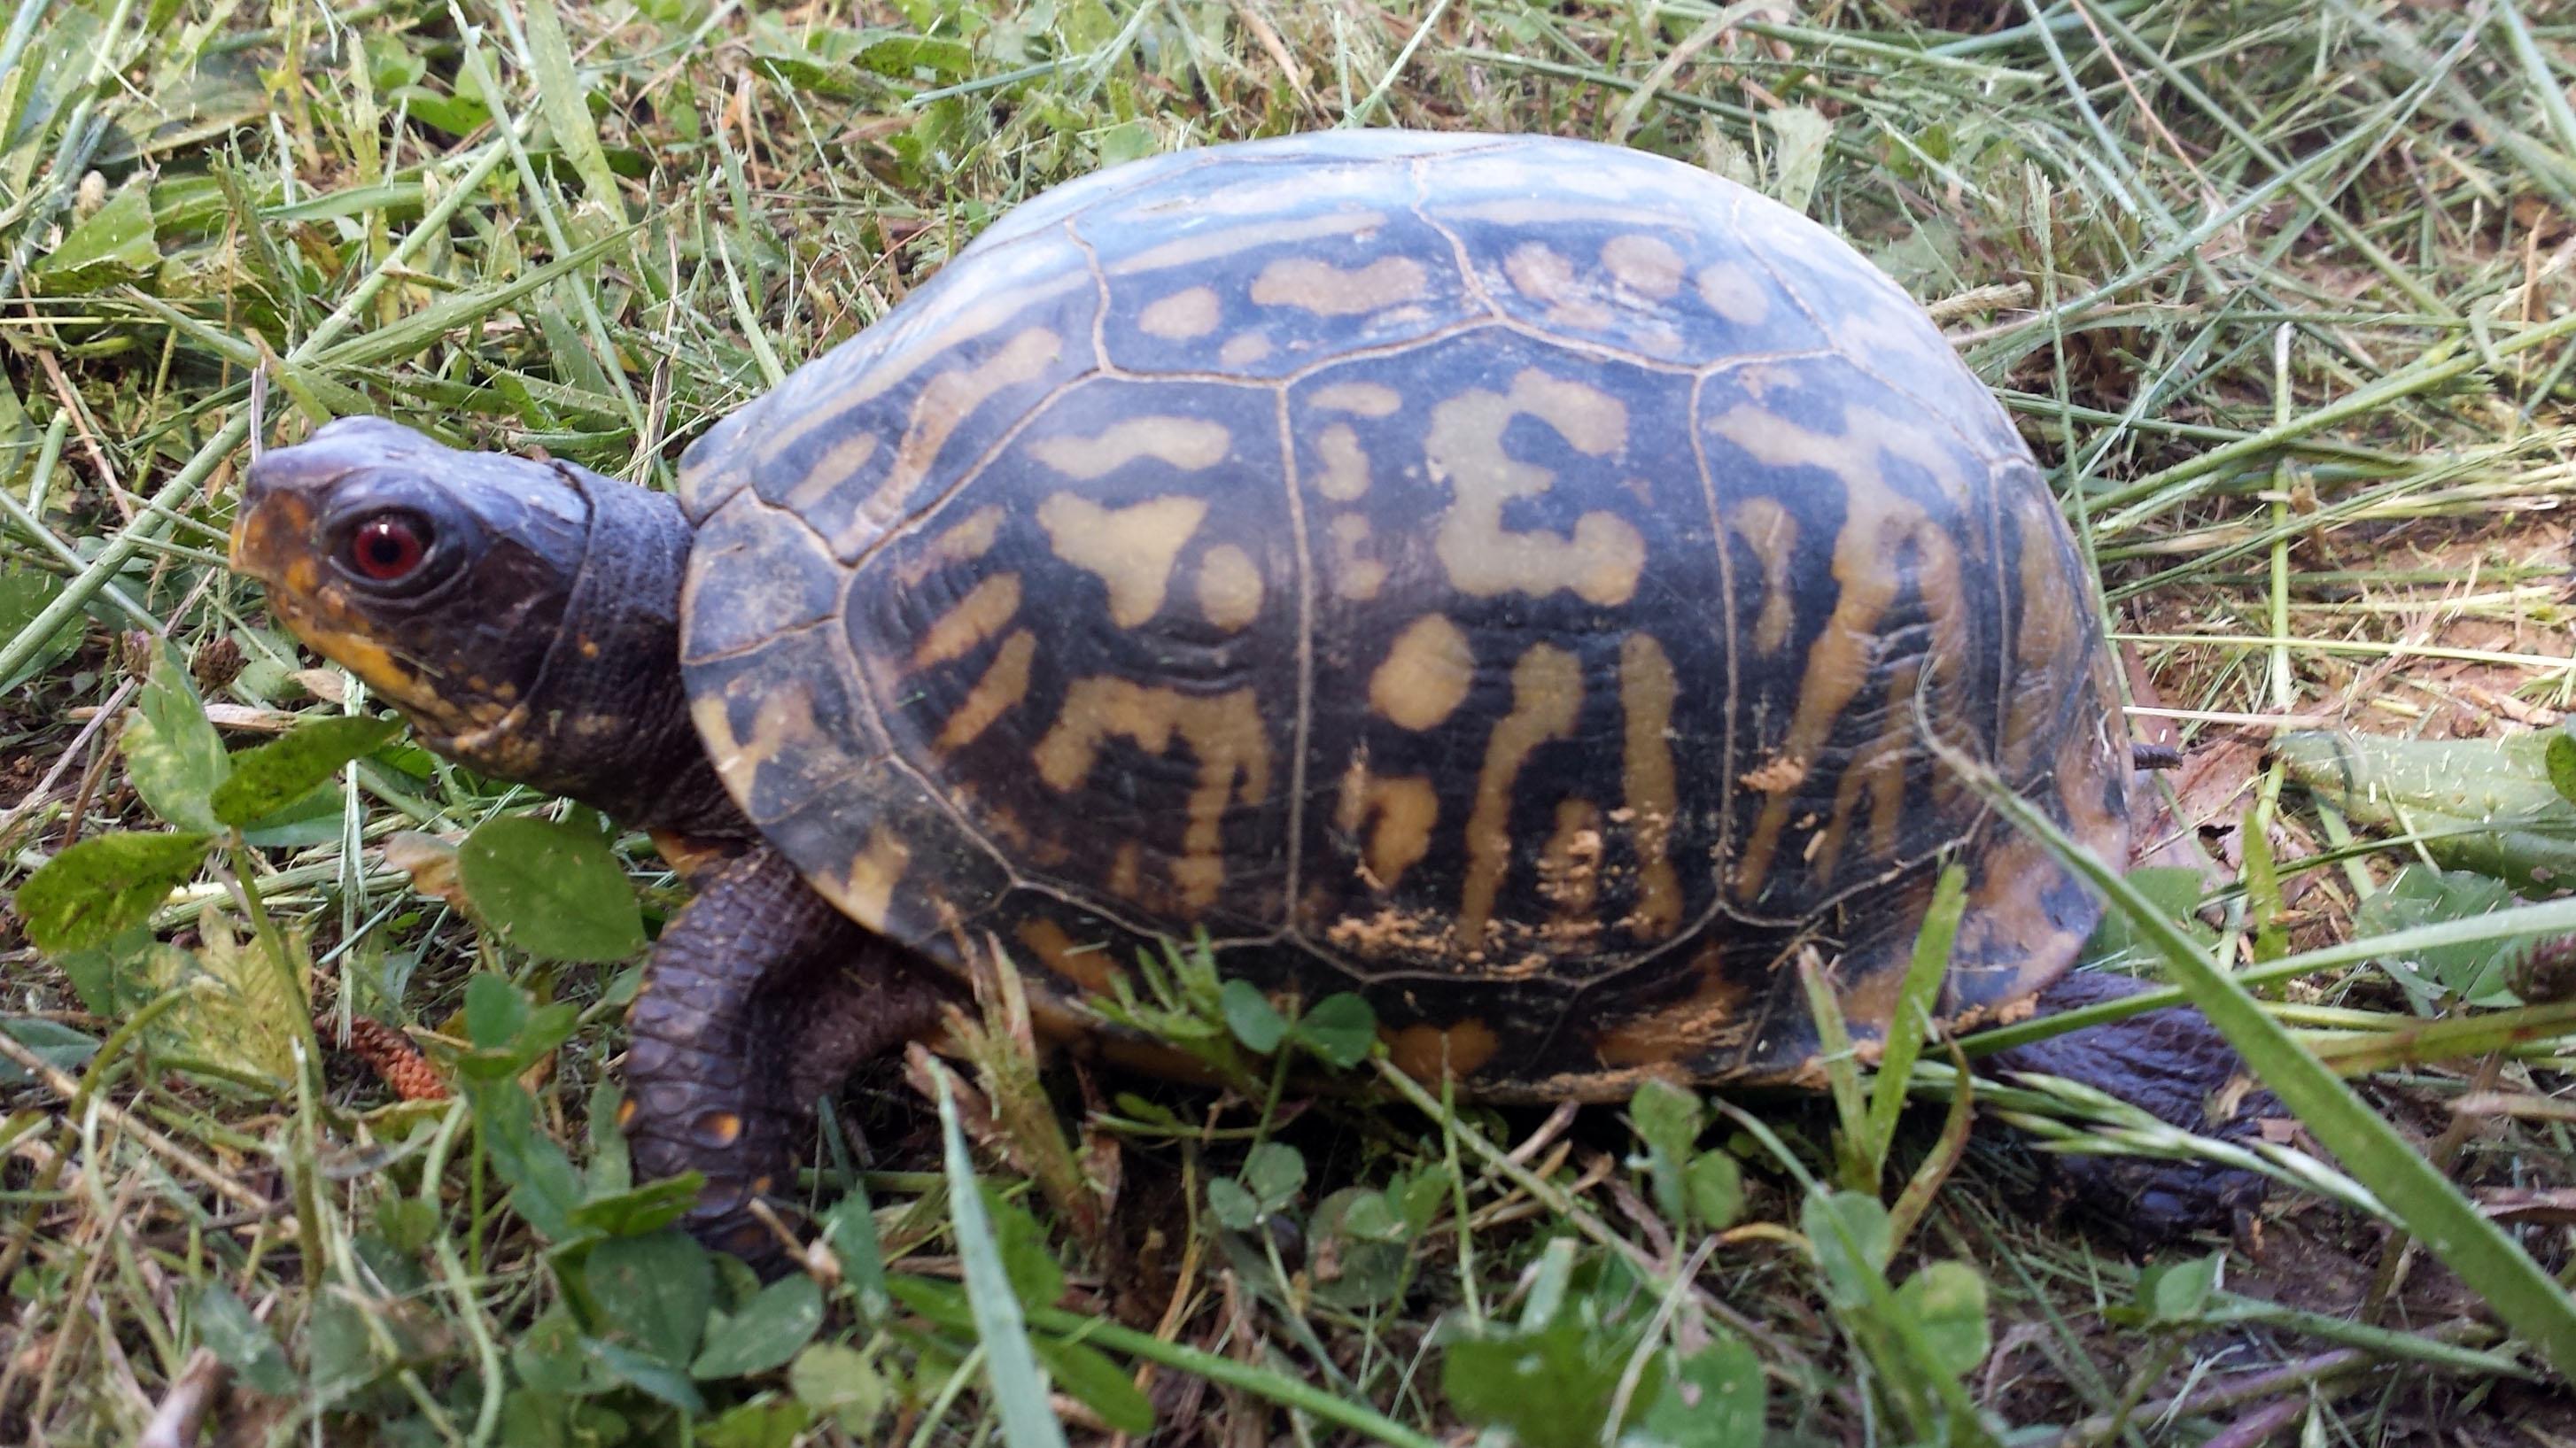 An American box turtle crawls through the grass.